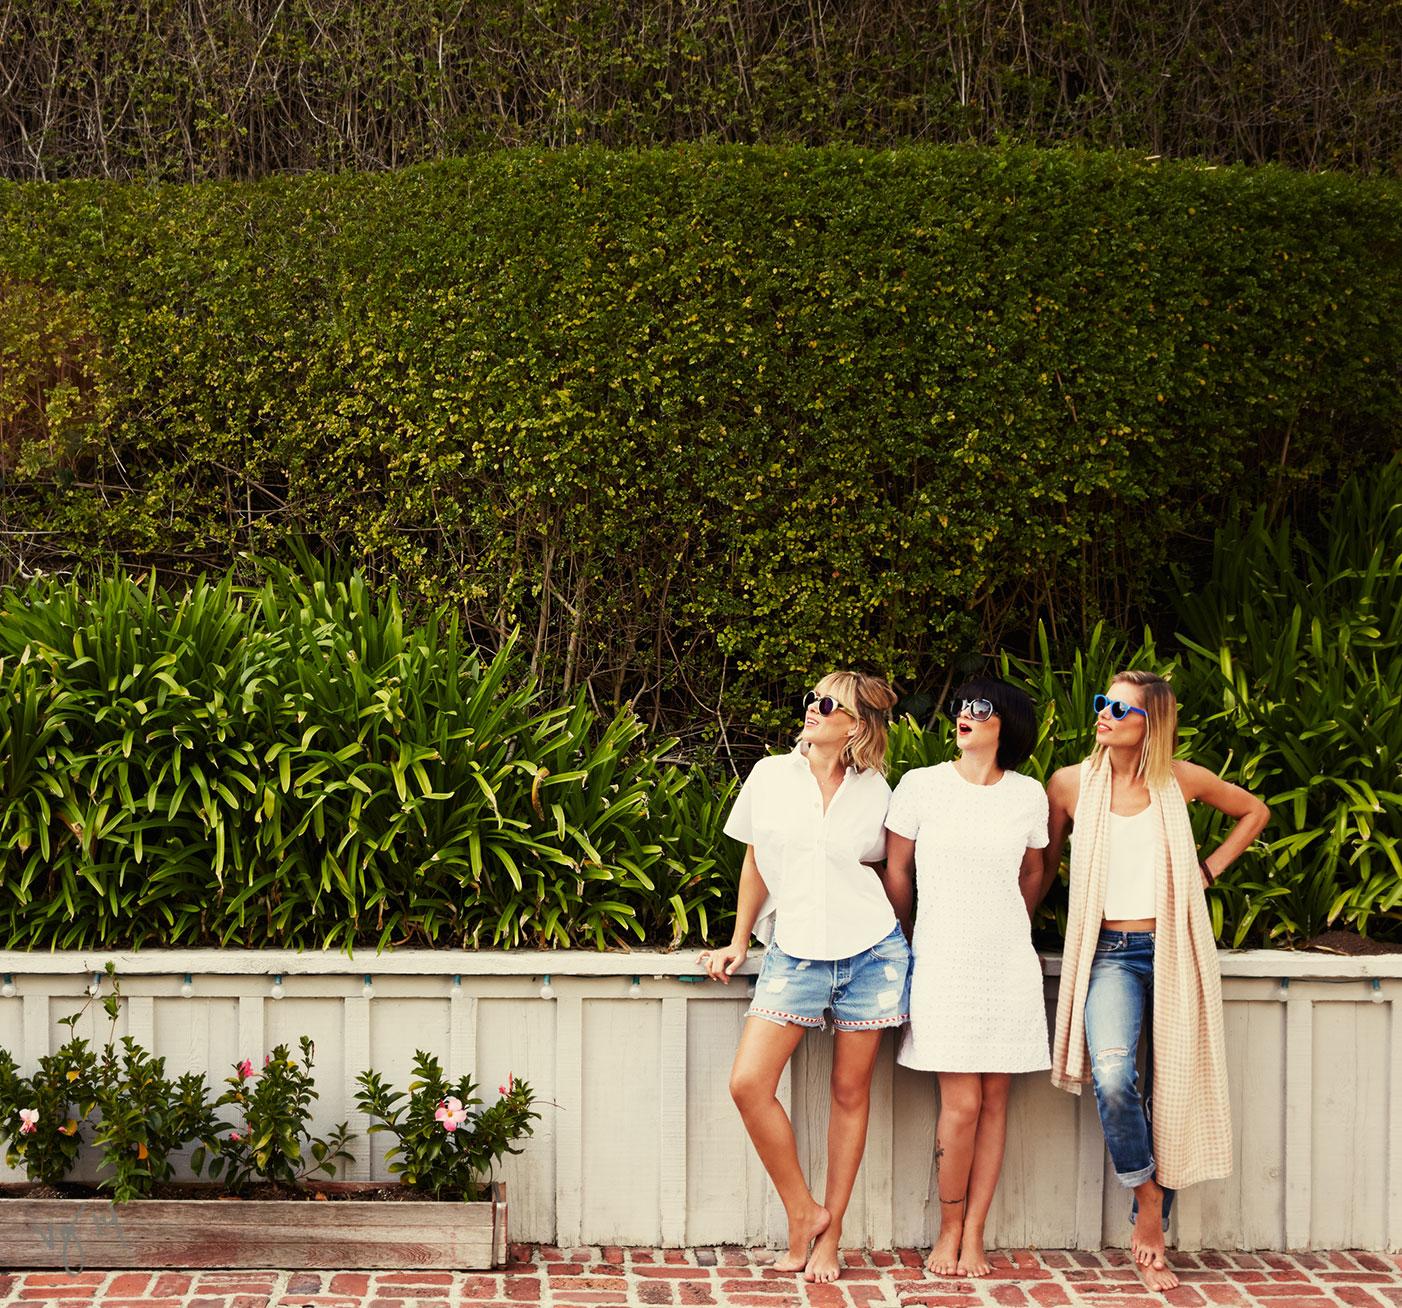 Ashley, Jen and Kristie Streicher talk beach beauty for THE VIOLET FILES #StreicherSecrets  |  #VioletGrey, The Industry's Beauty Edit